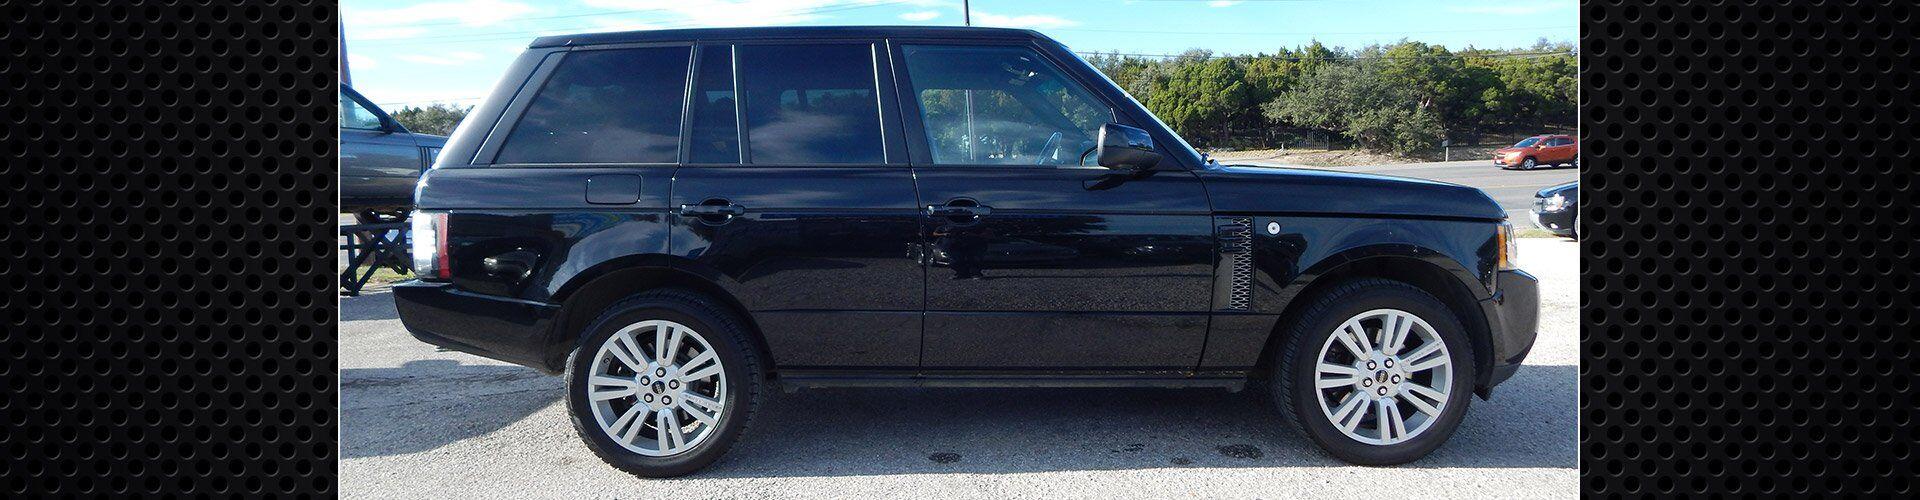 Used Car Dealership Austin Tx Emotion Motor Sports